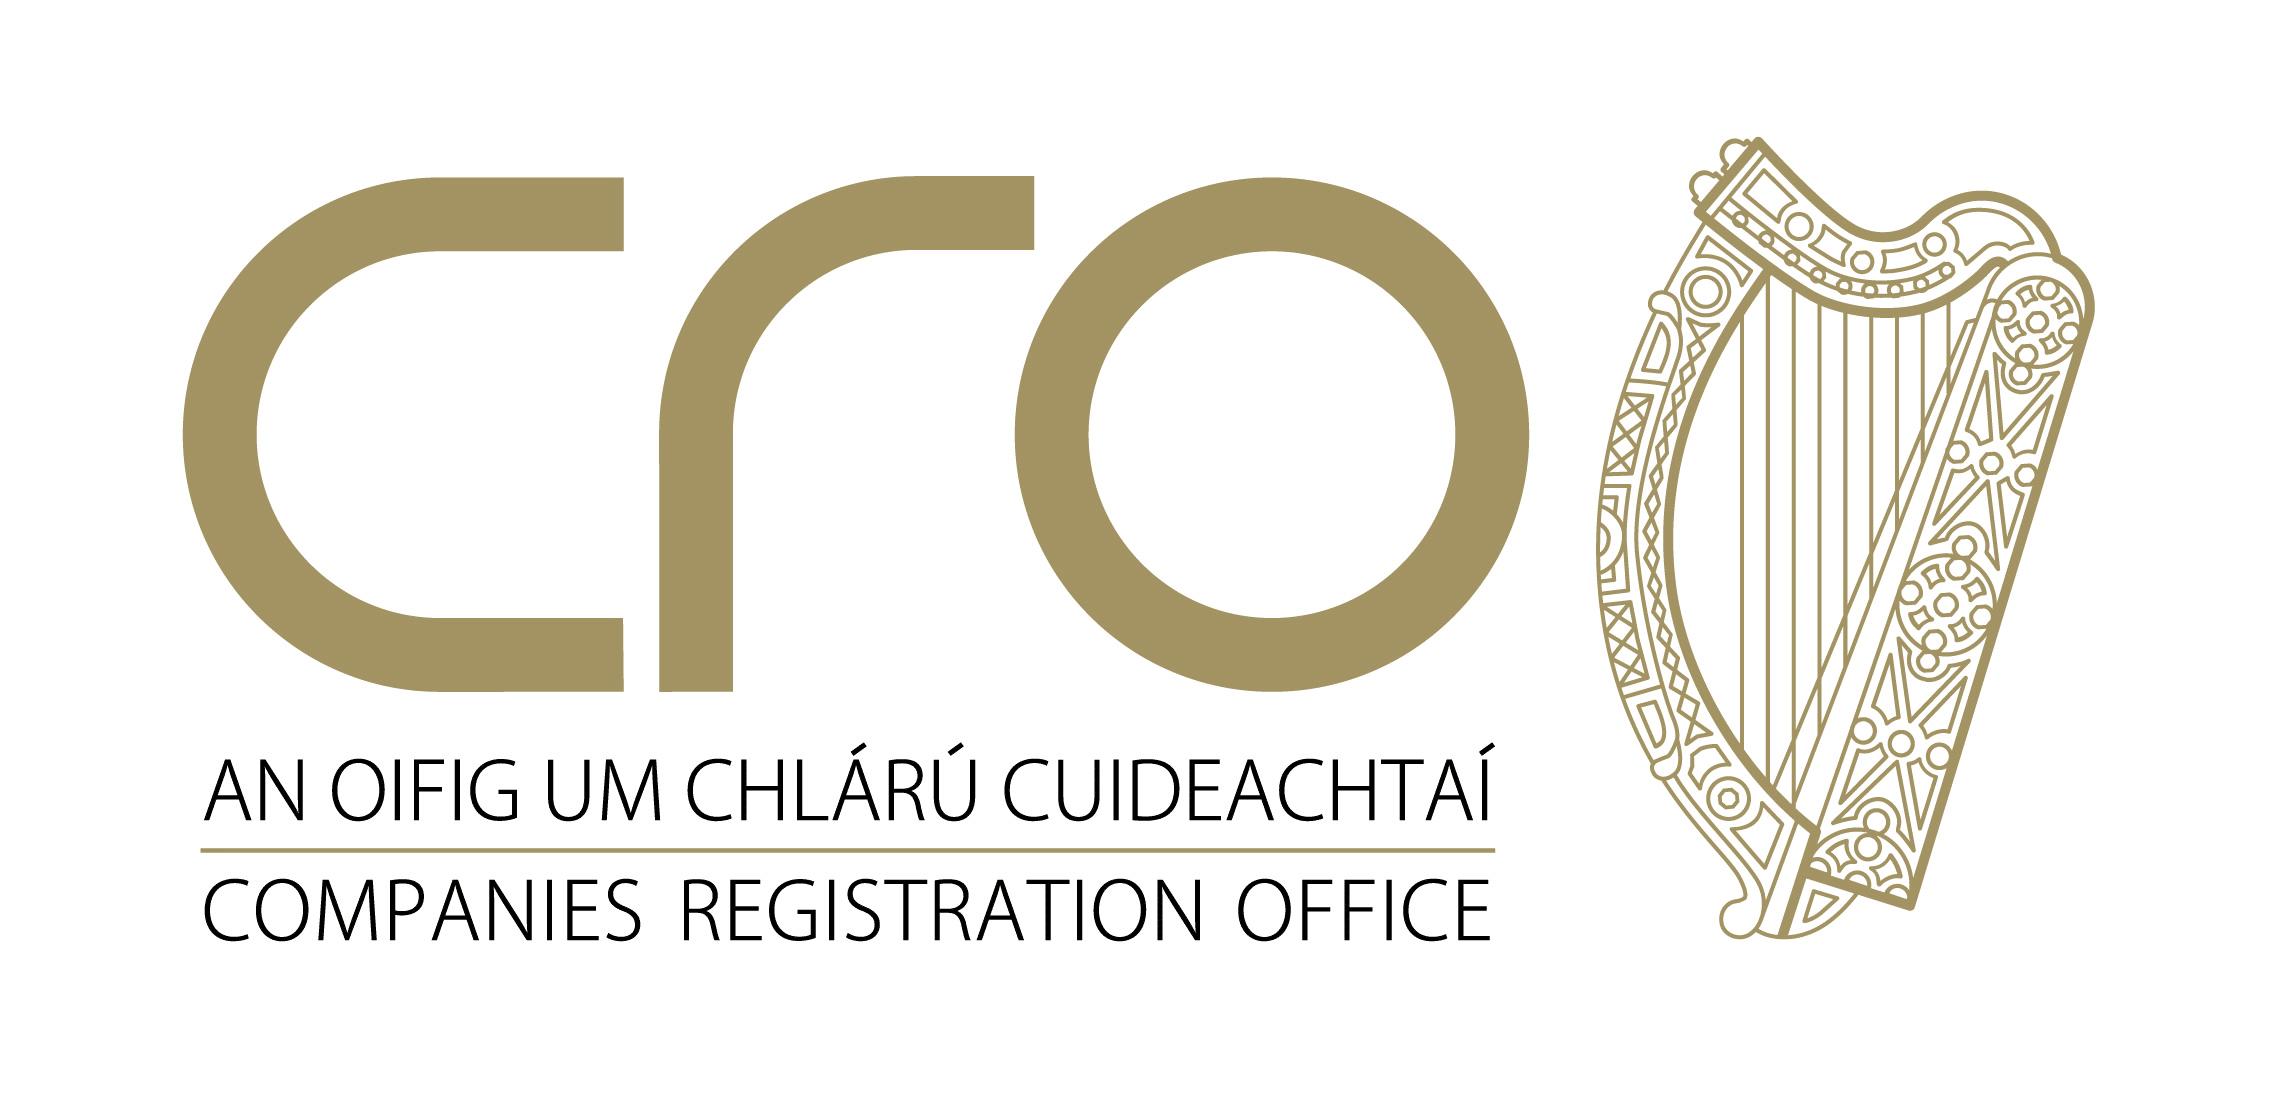 companies registration office